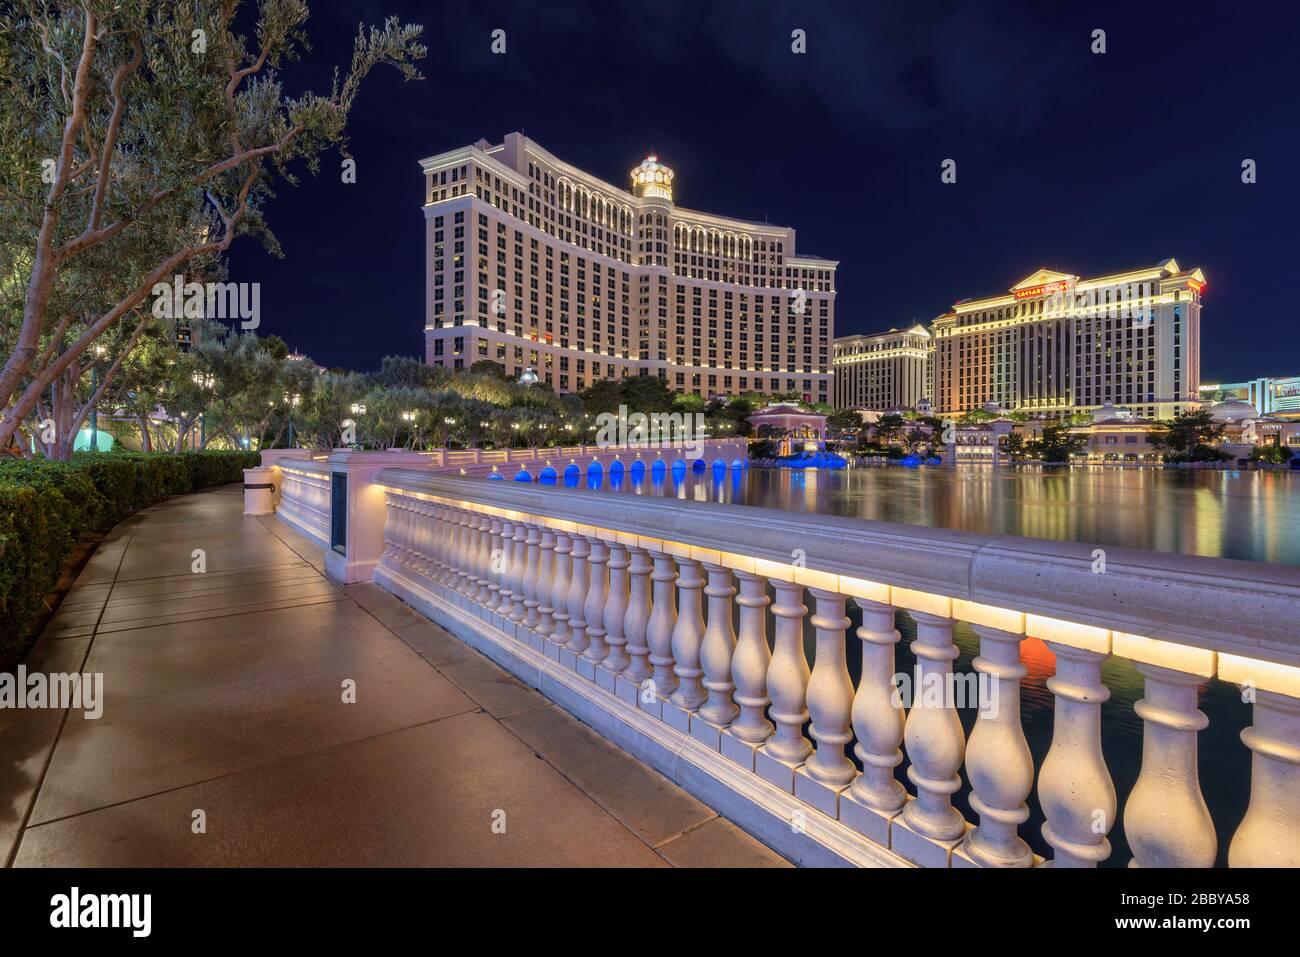 Bellagio hotel and casino in Las Vegas, Nevada Stock Photo